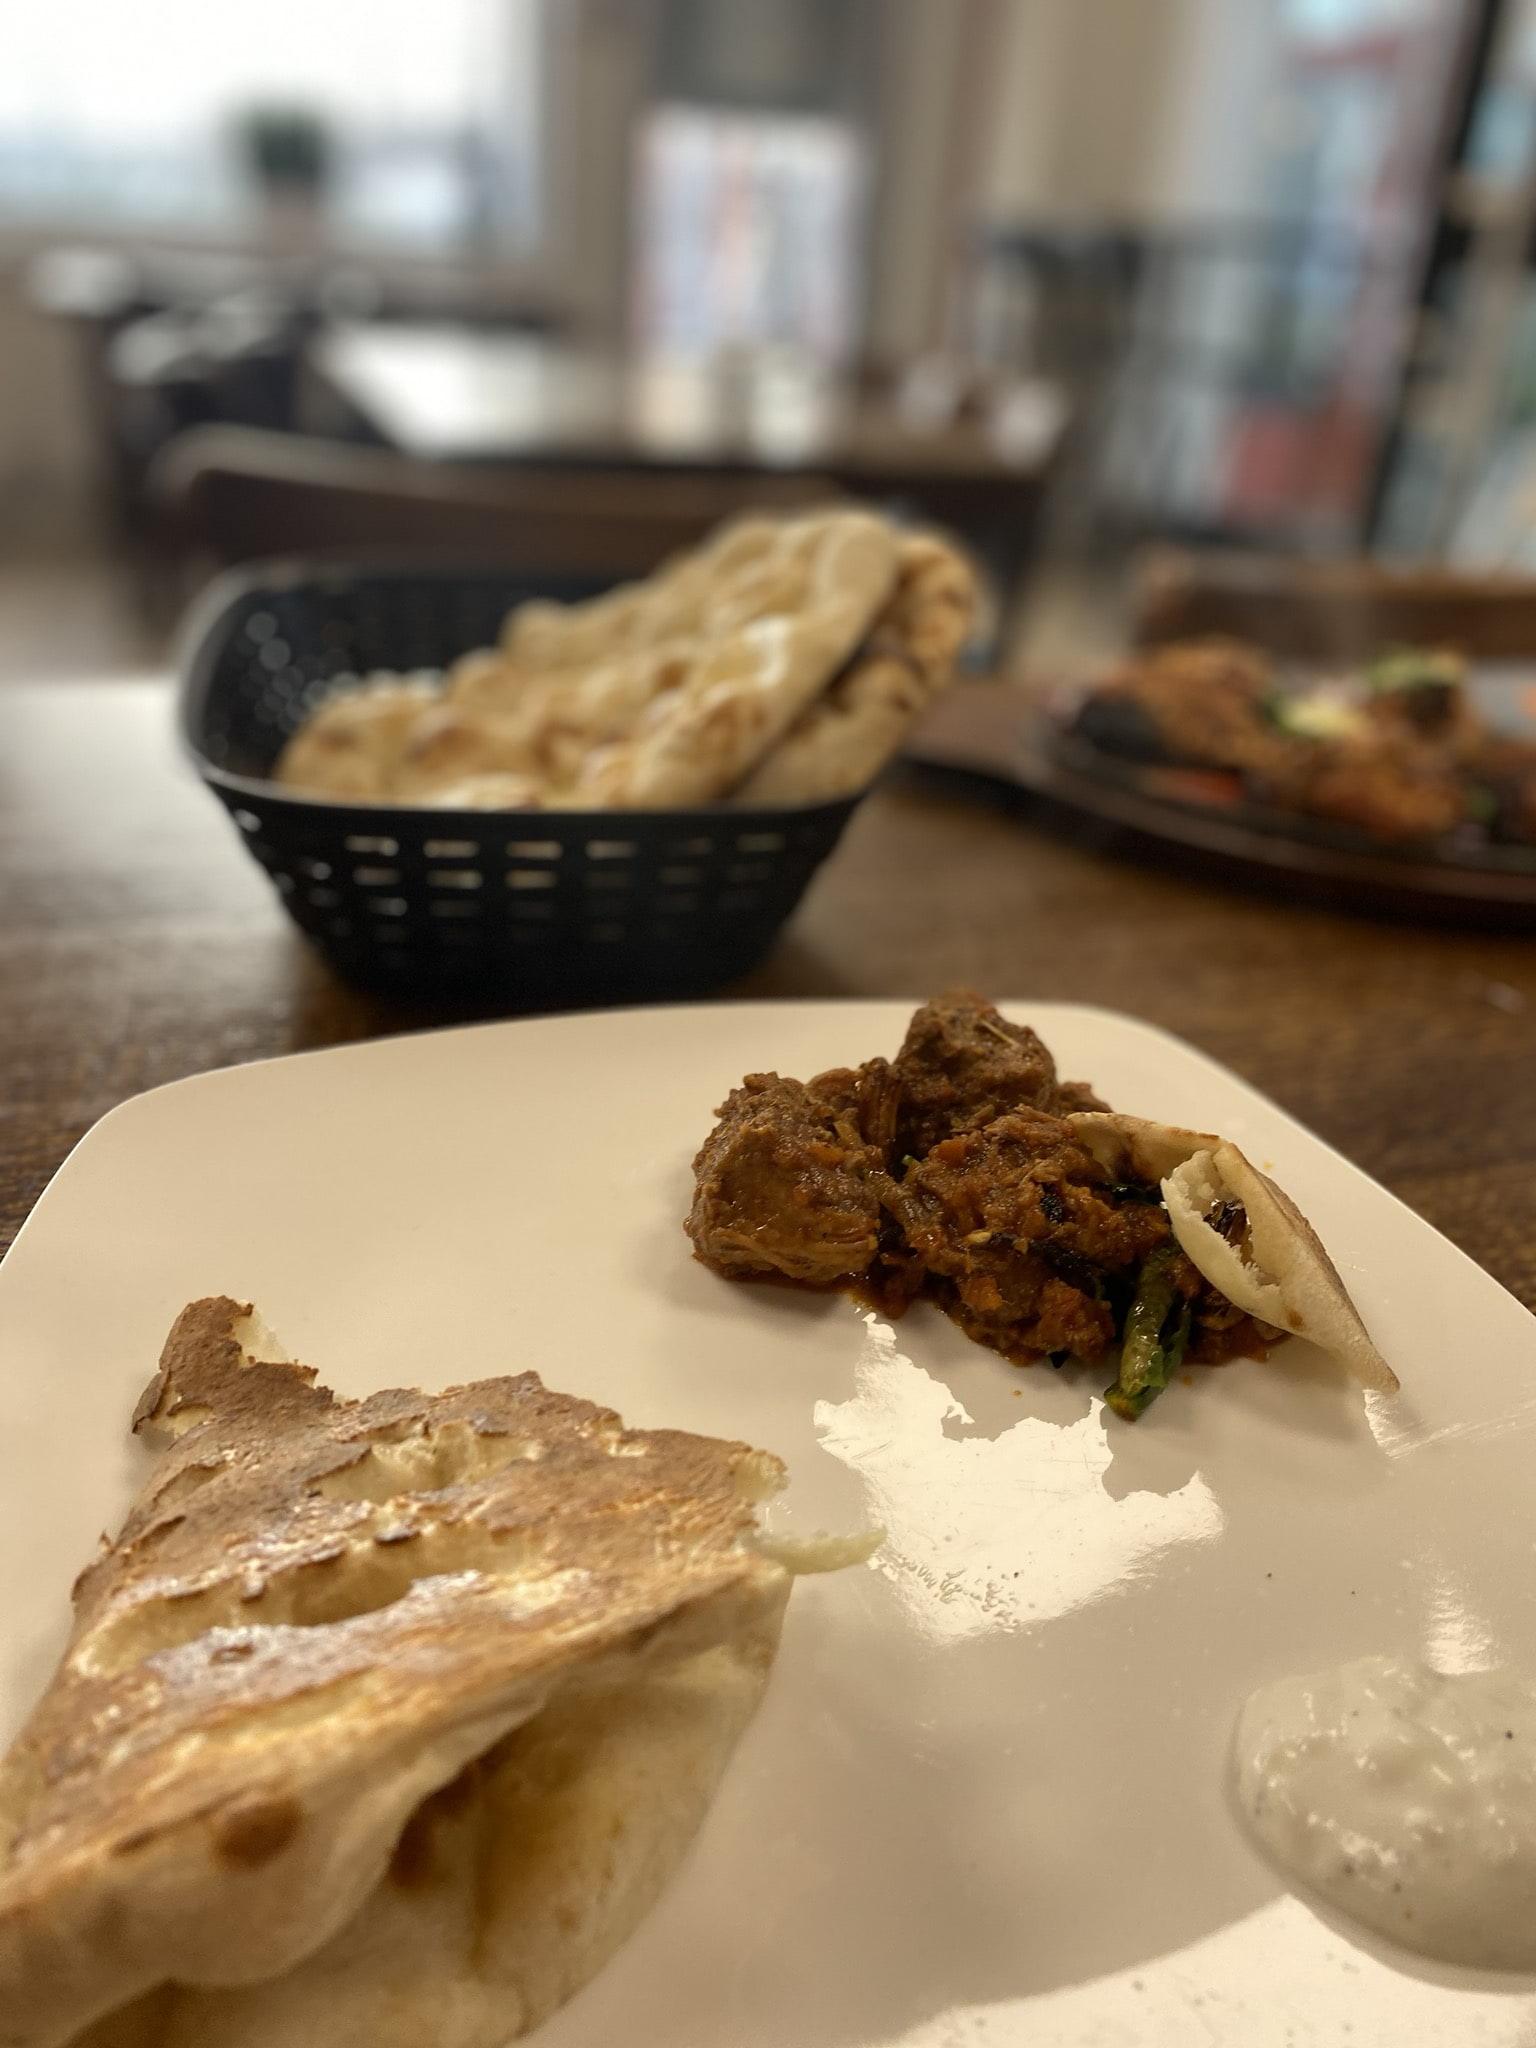 Mutton kerai with freshly baked naan – Bild från Spice Villa av Madiha S.